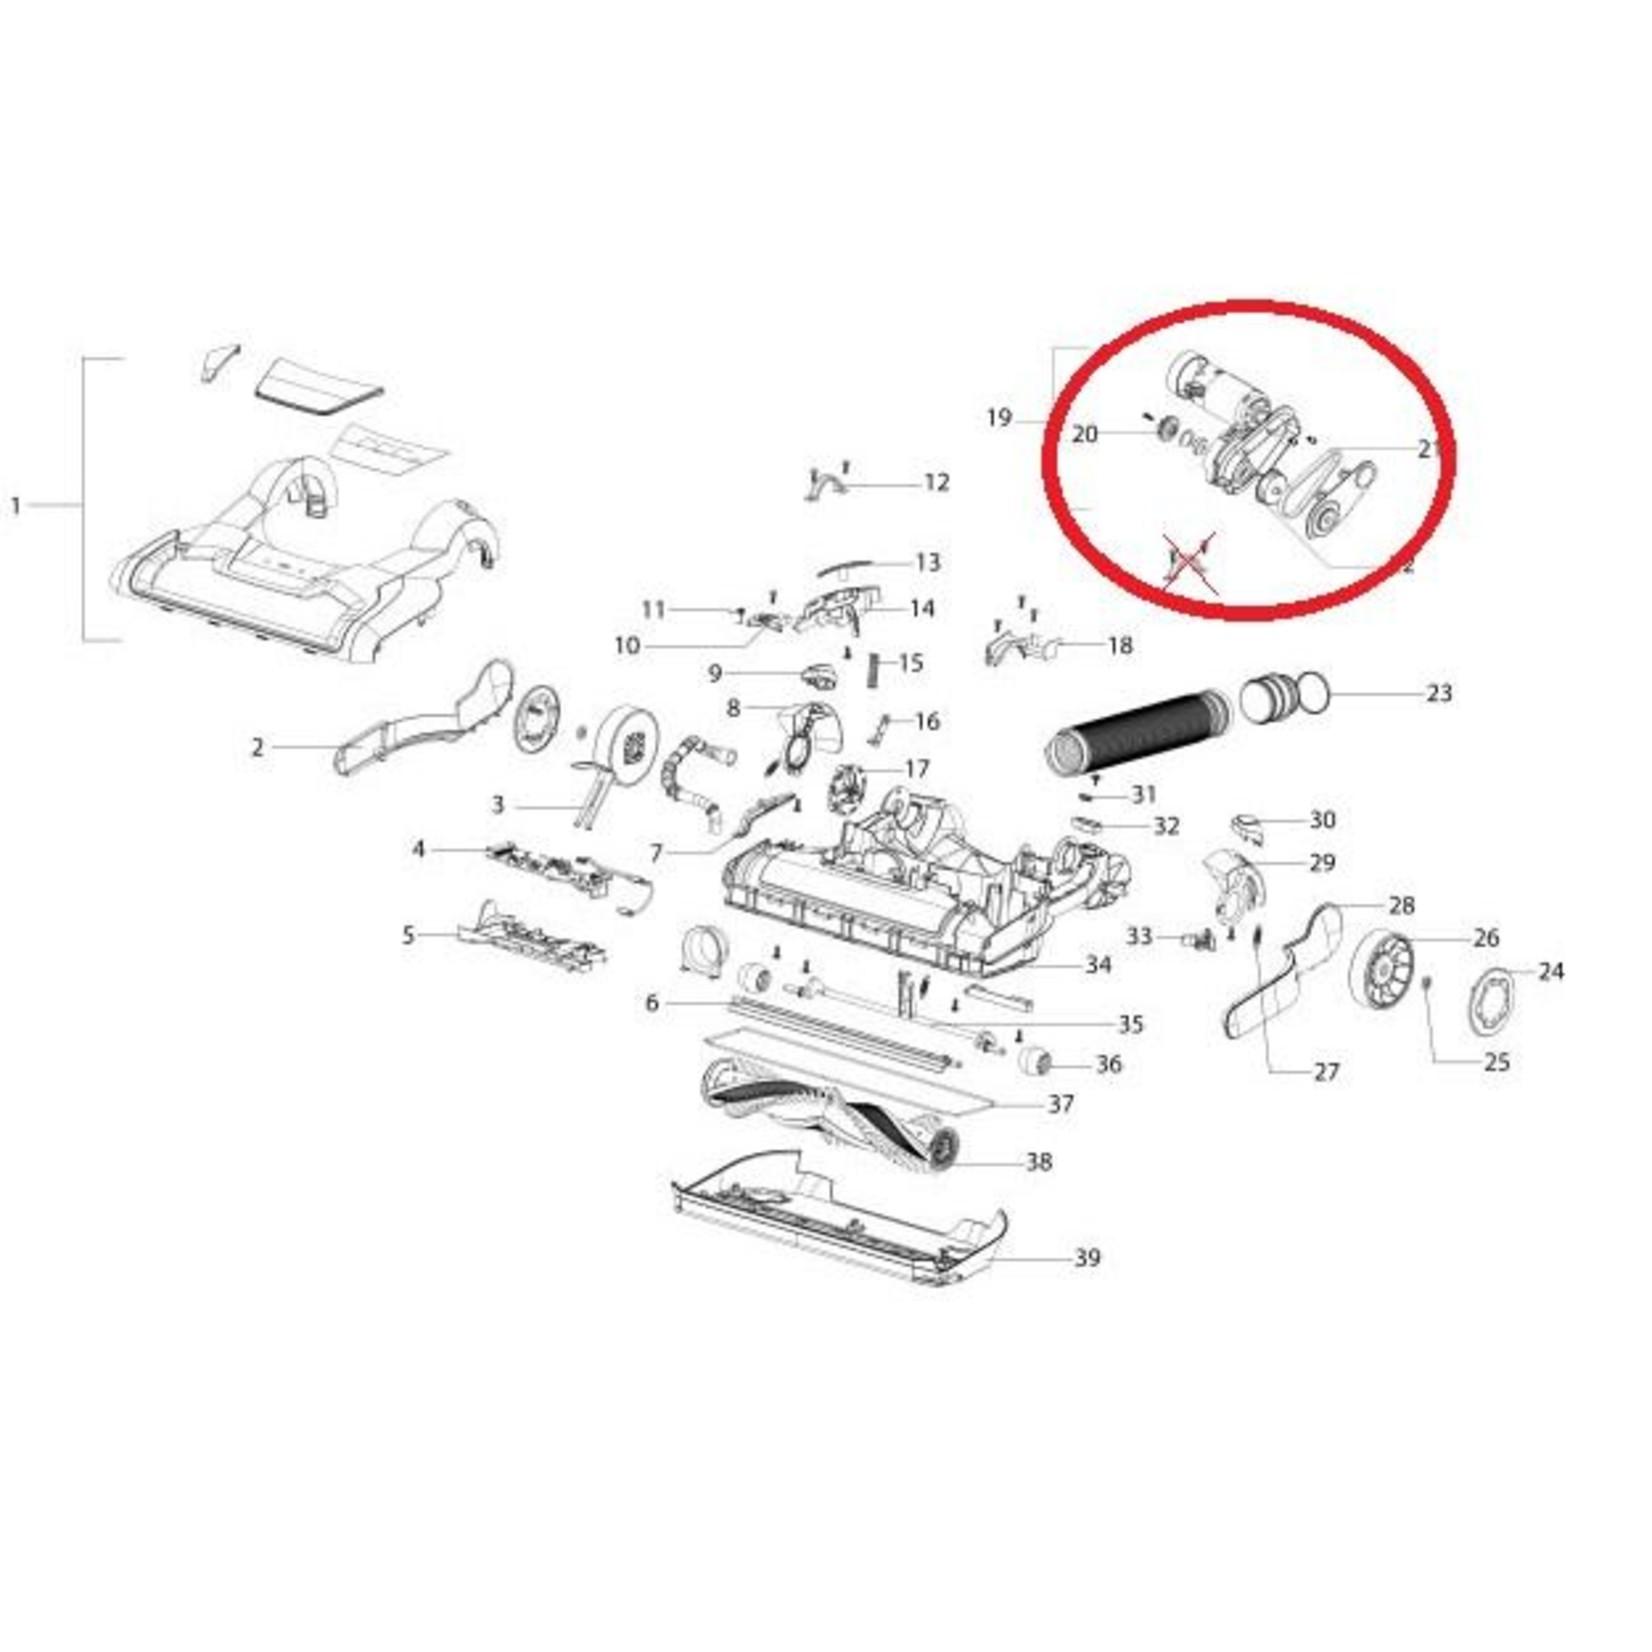 BEAM BEAM Precision Motor Housing Assembly